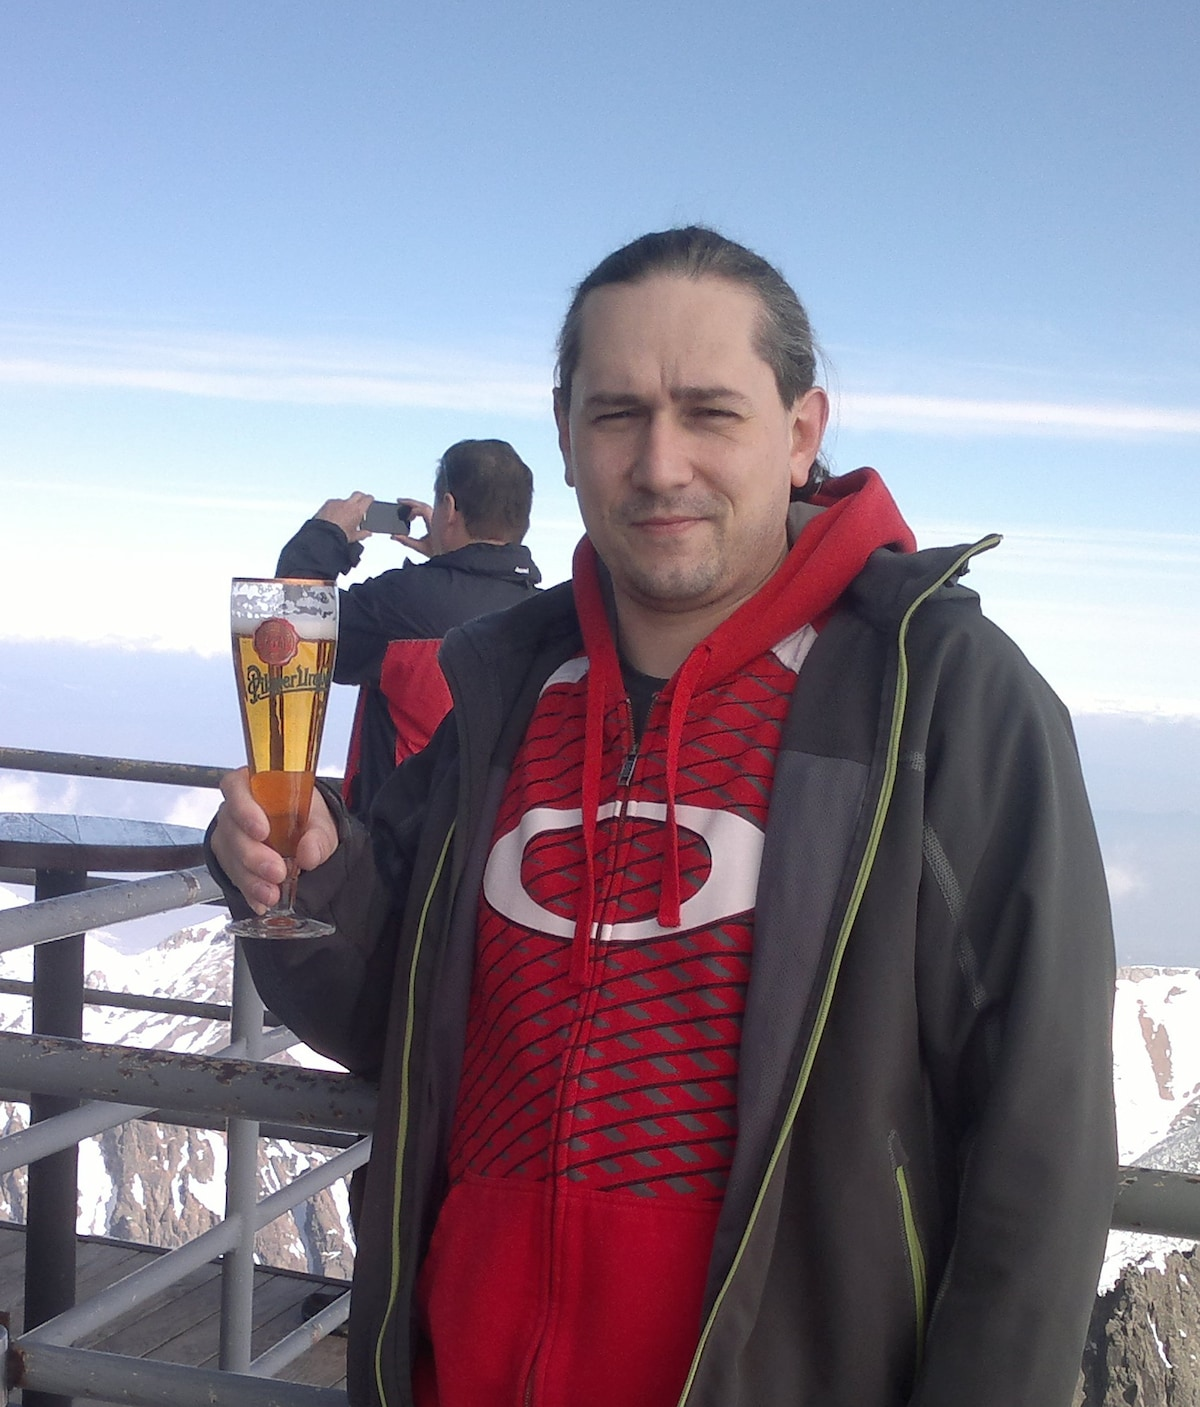 Petr from Praha